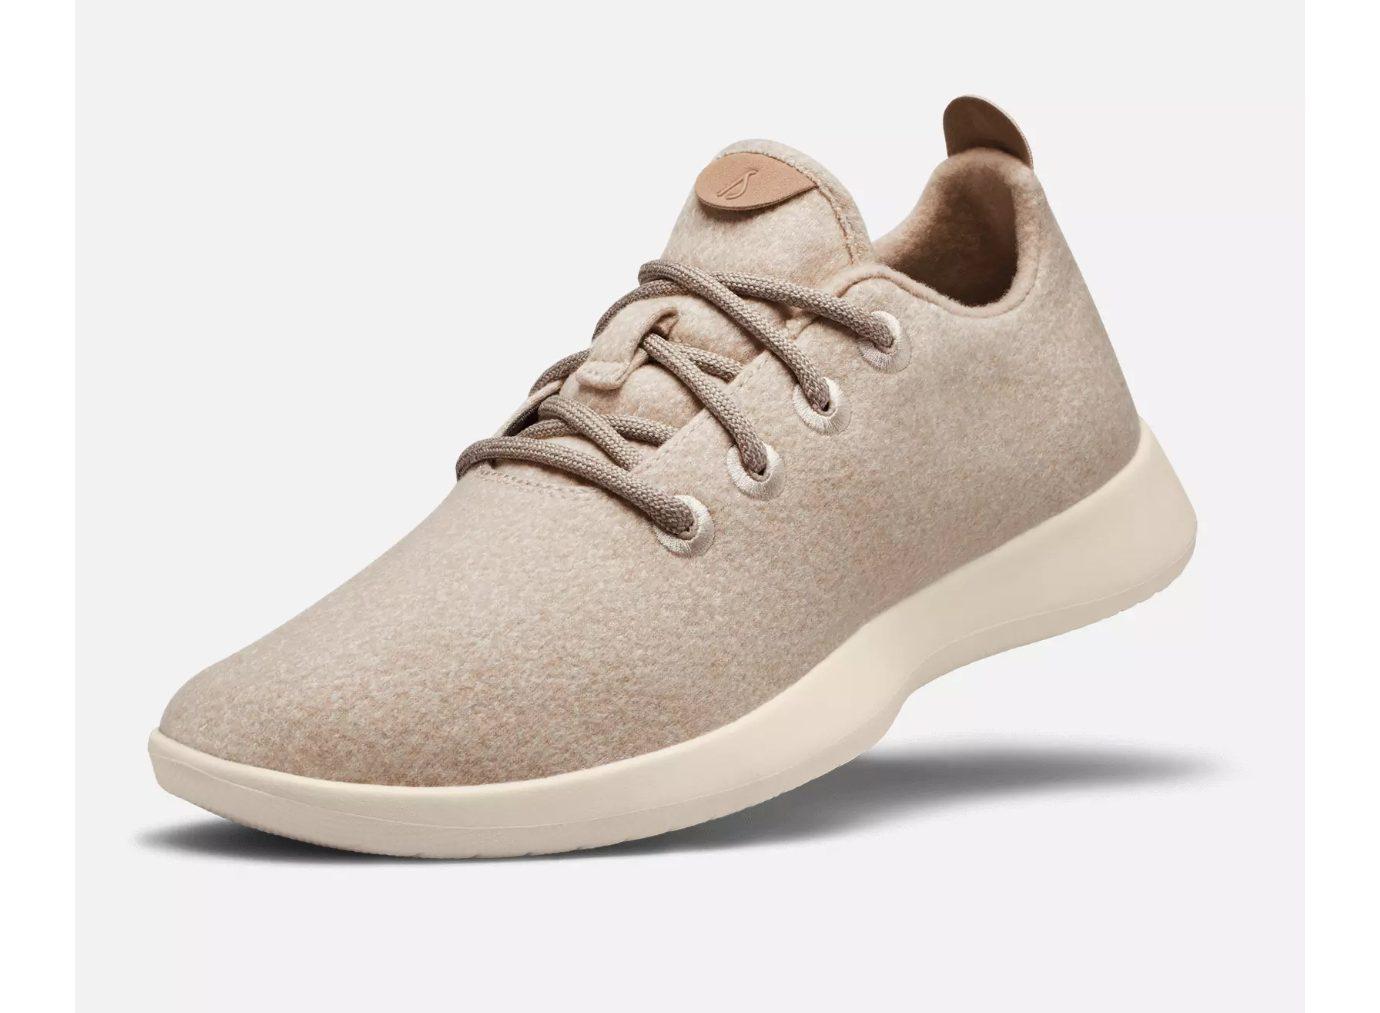 Comfortable travel shoes: Allbirds